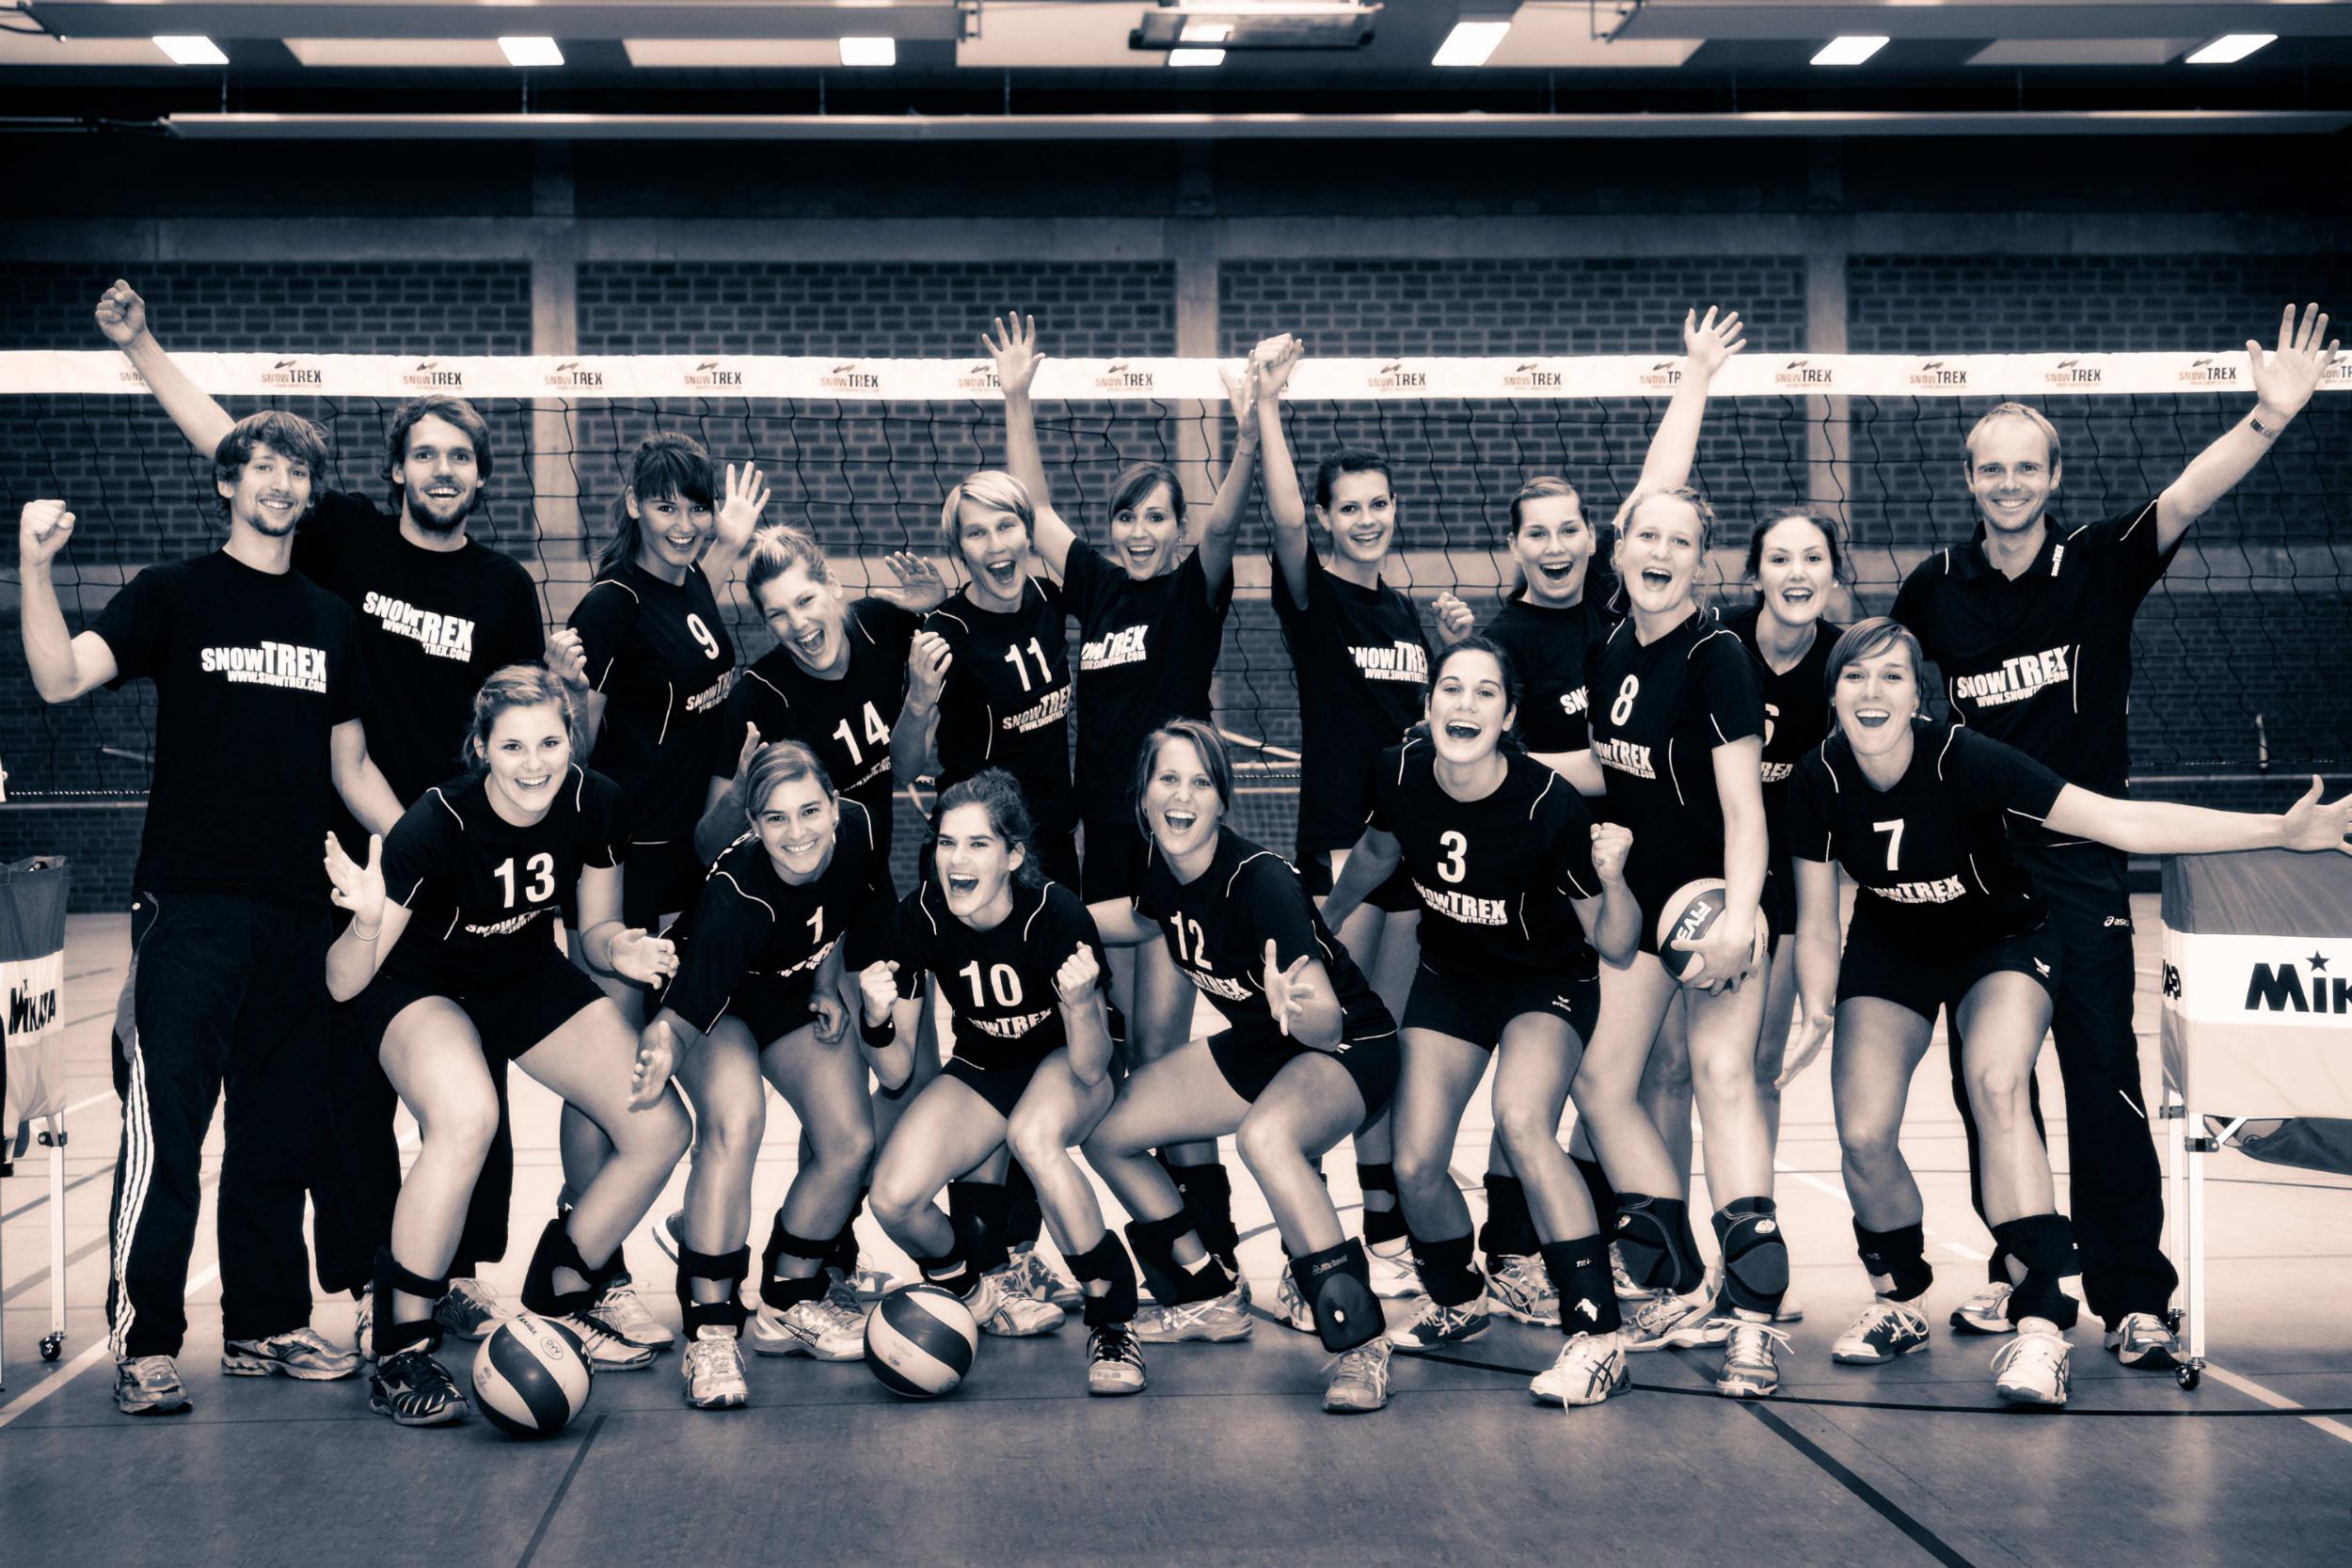 Volleyballteam DSHS SnowTrex Köln.png